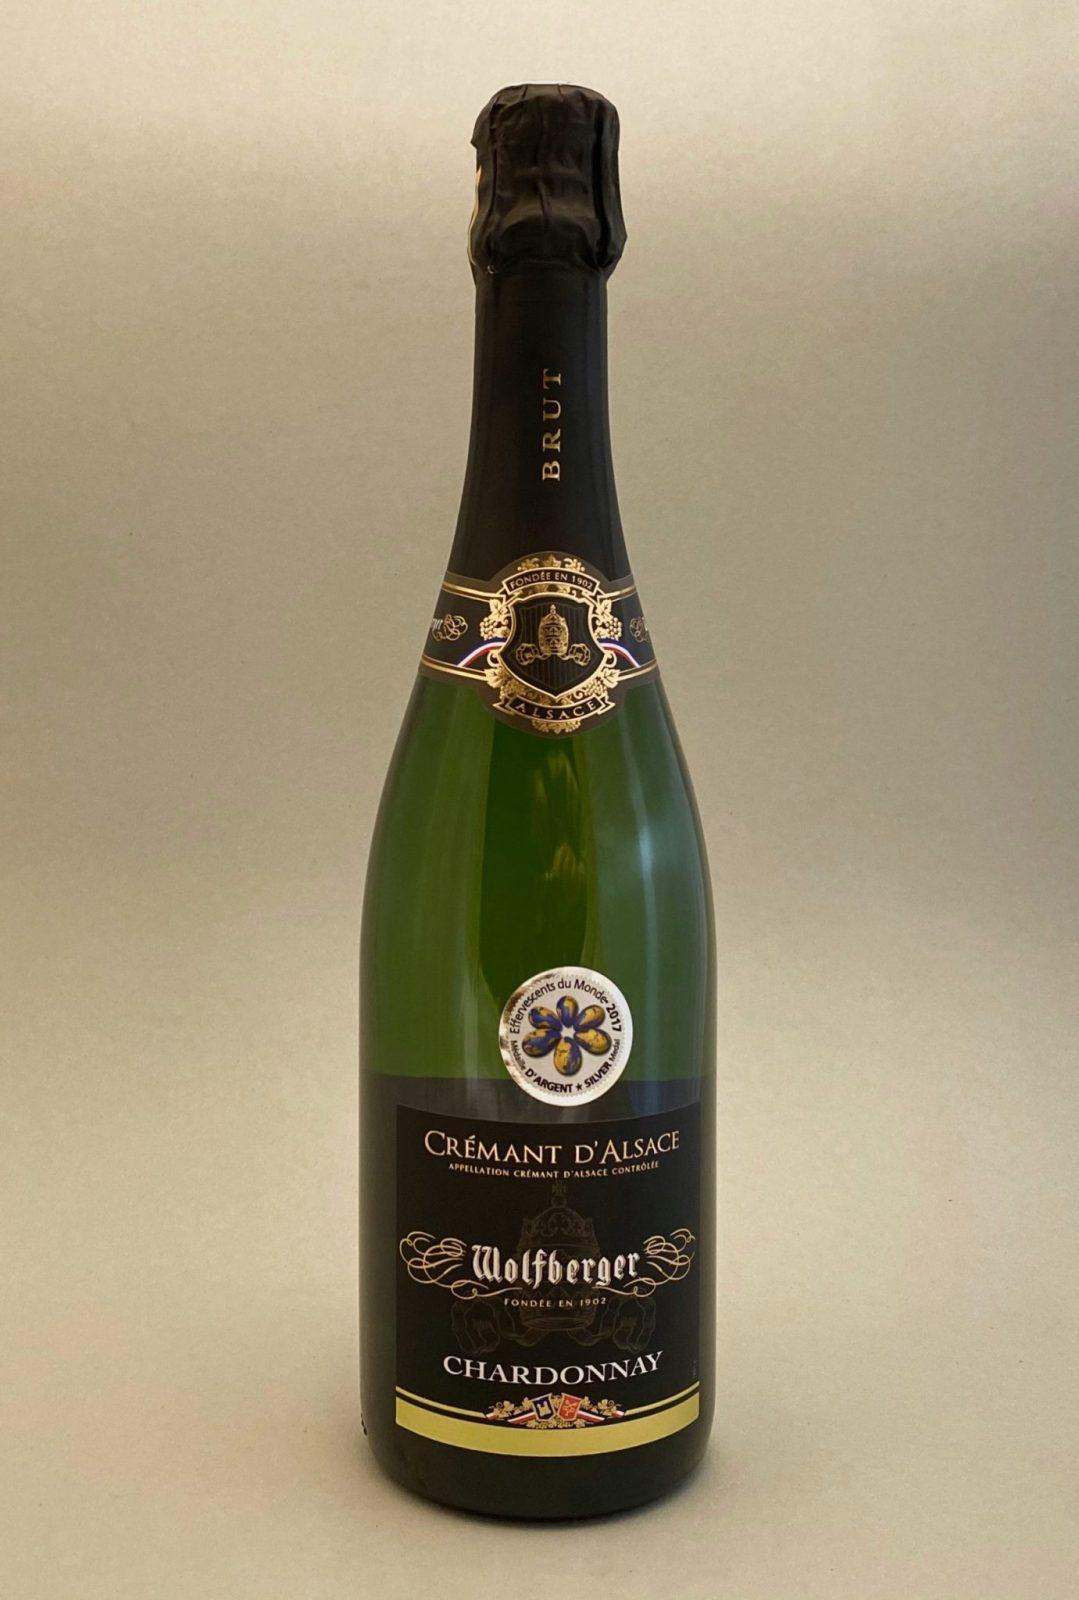 Bulbinkove vino, vinotéka Bratislava Slnecnice, Sunnywines, rozvoz vina, winebar, WOLFBERGER Crémant D'Alsace Chardonnay Brut